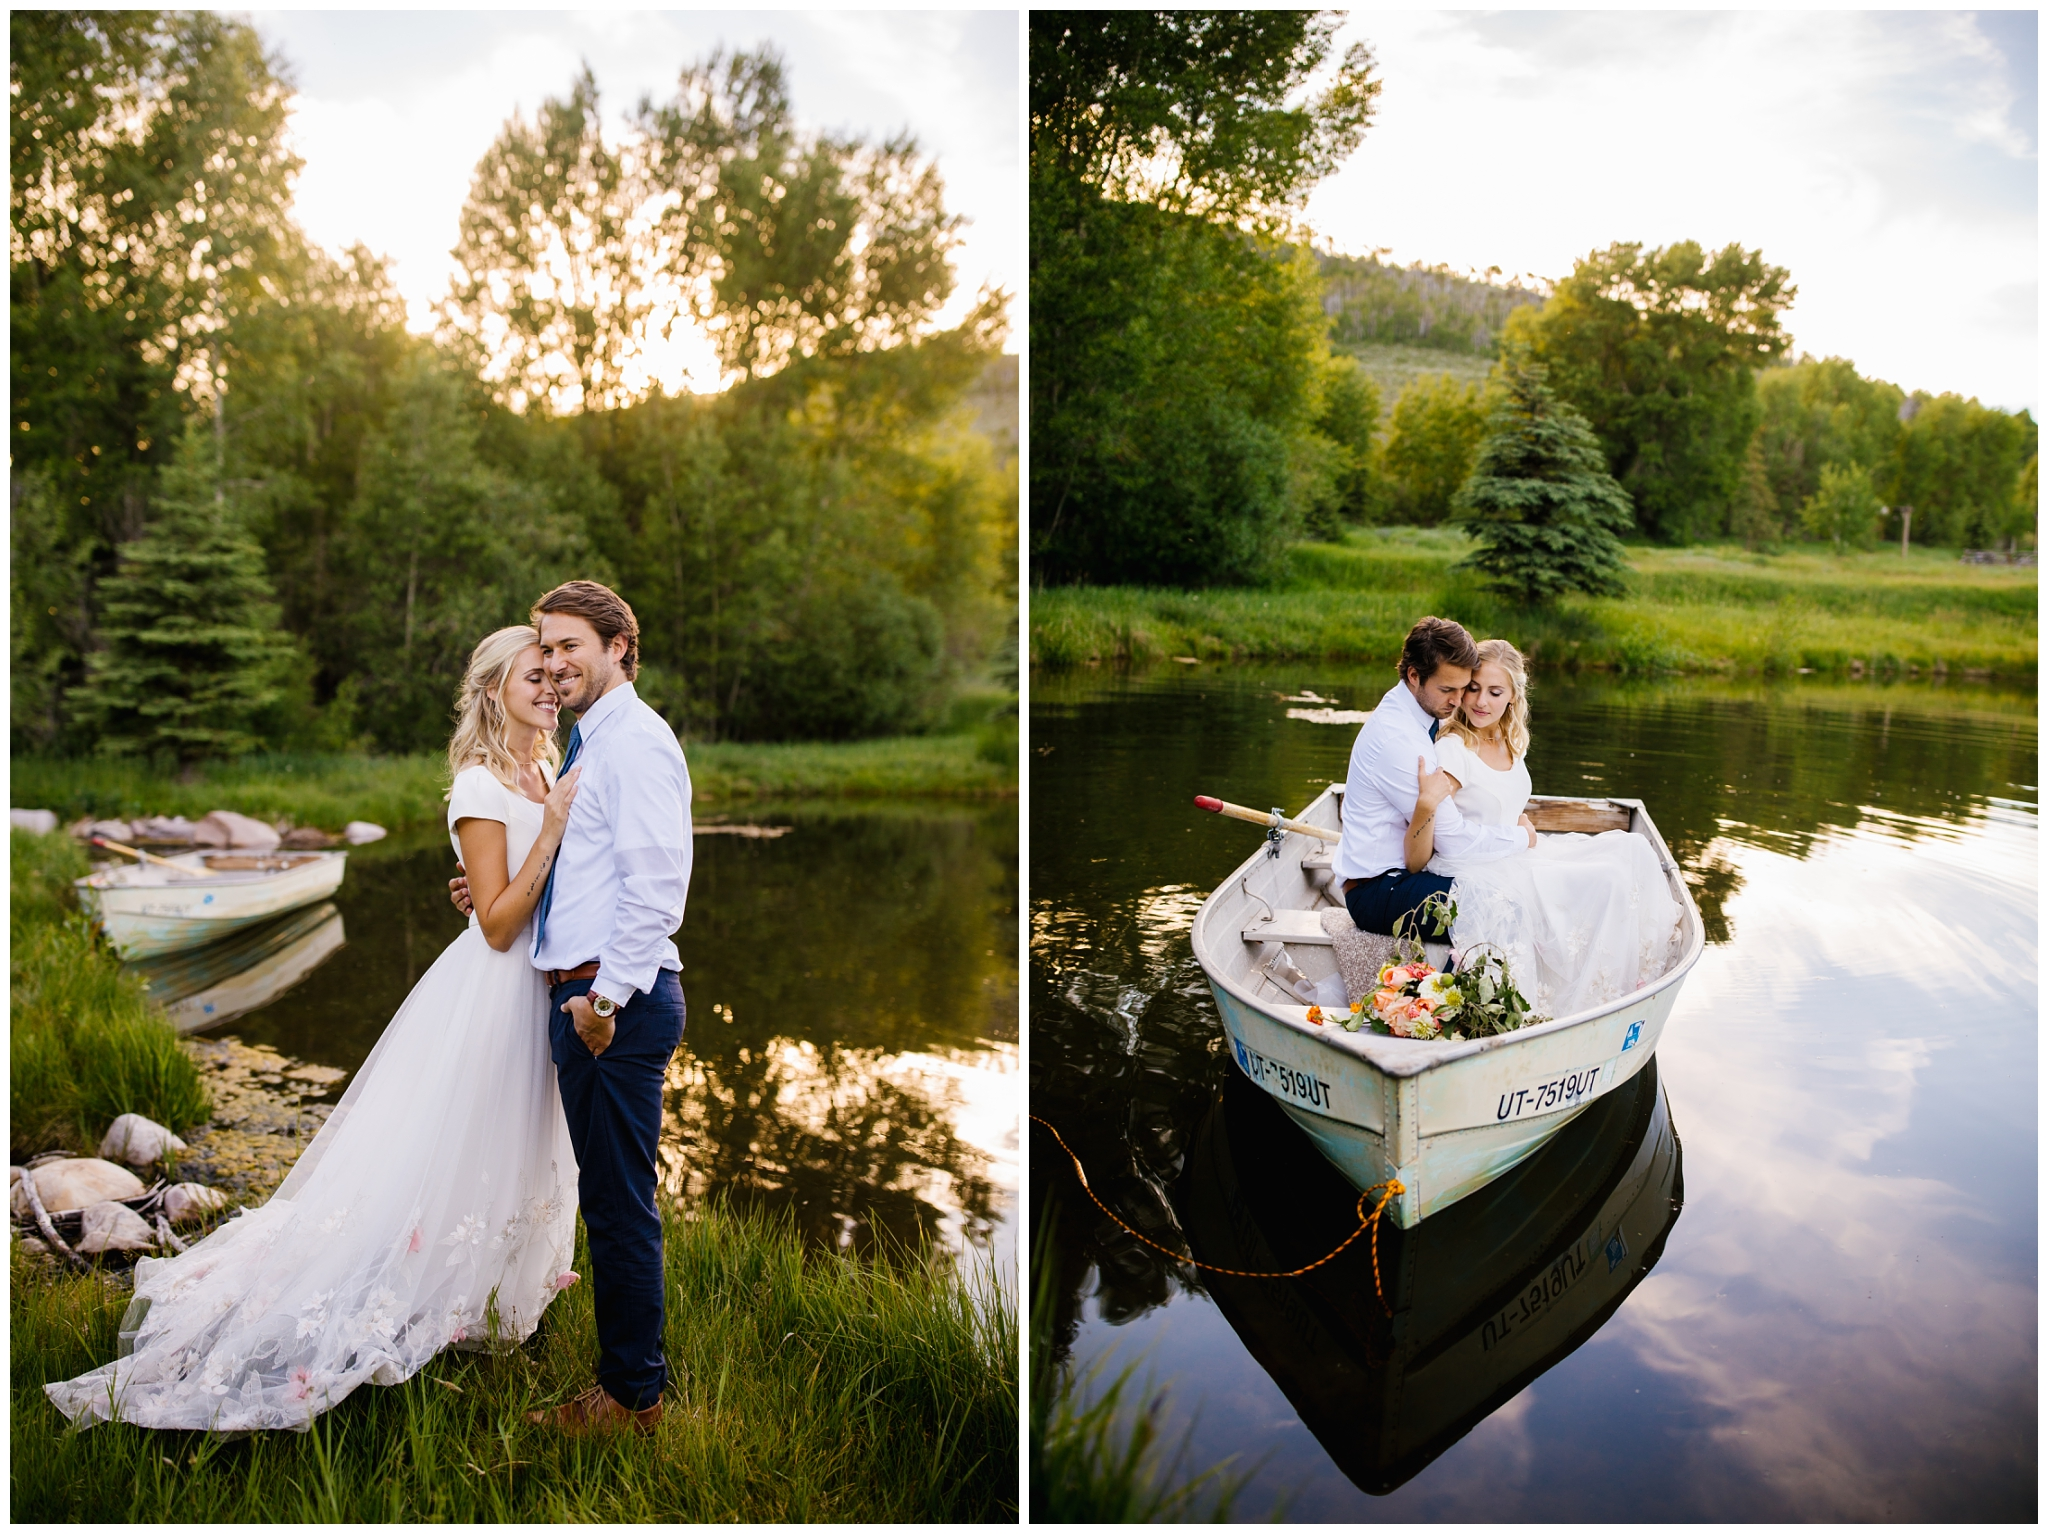 Lizzie-B-Imagery-Utah-Wedding-Photographer-Park-City-Photographer_0036.jpg